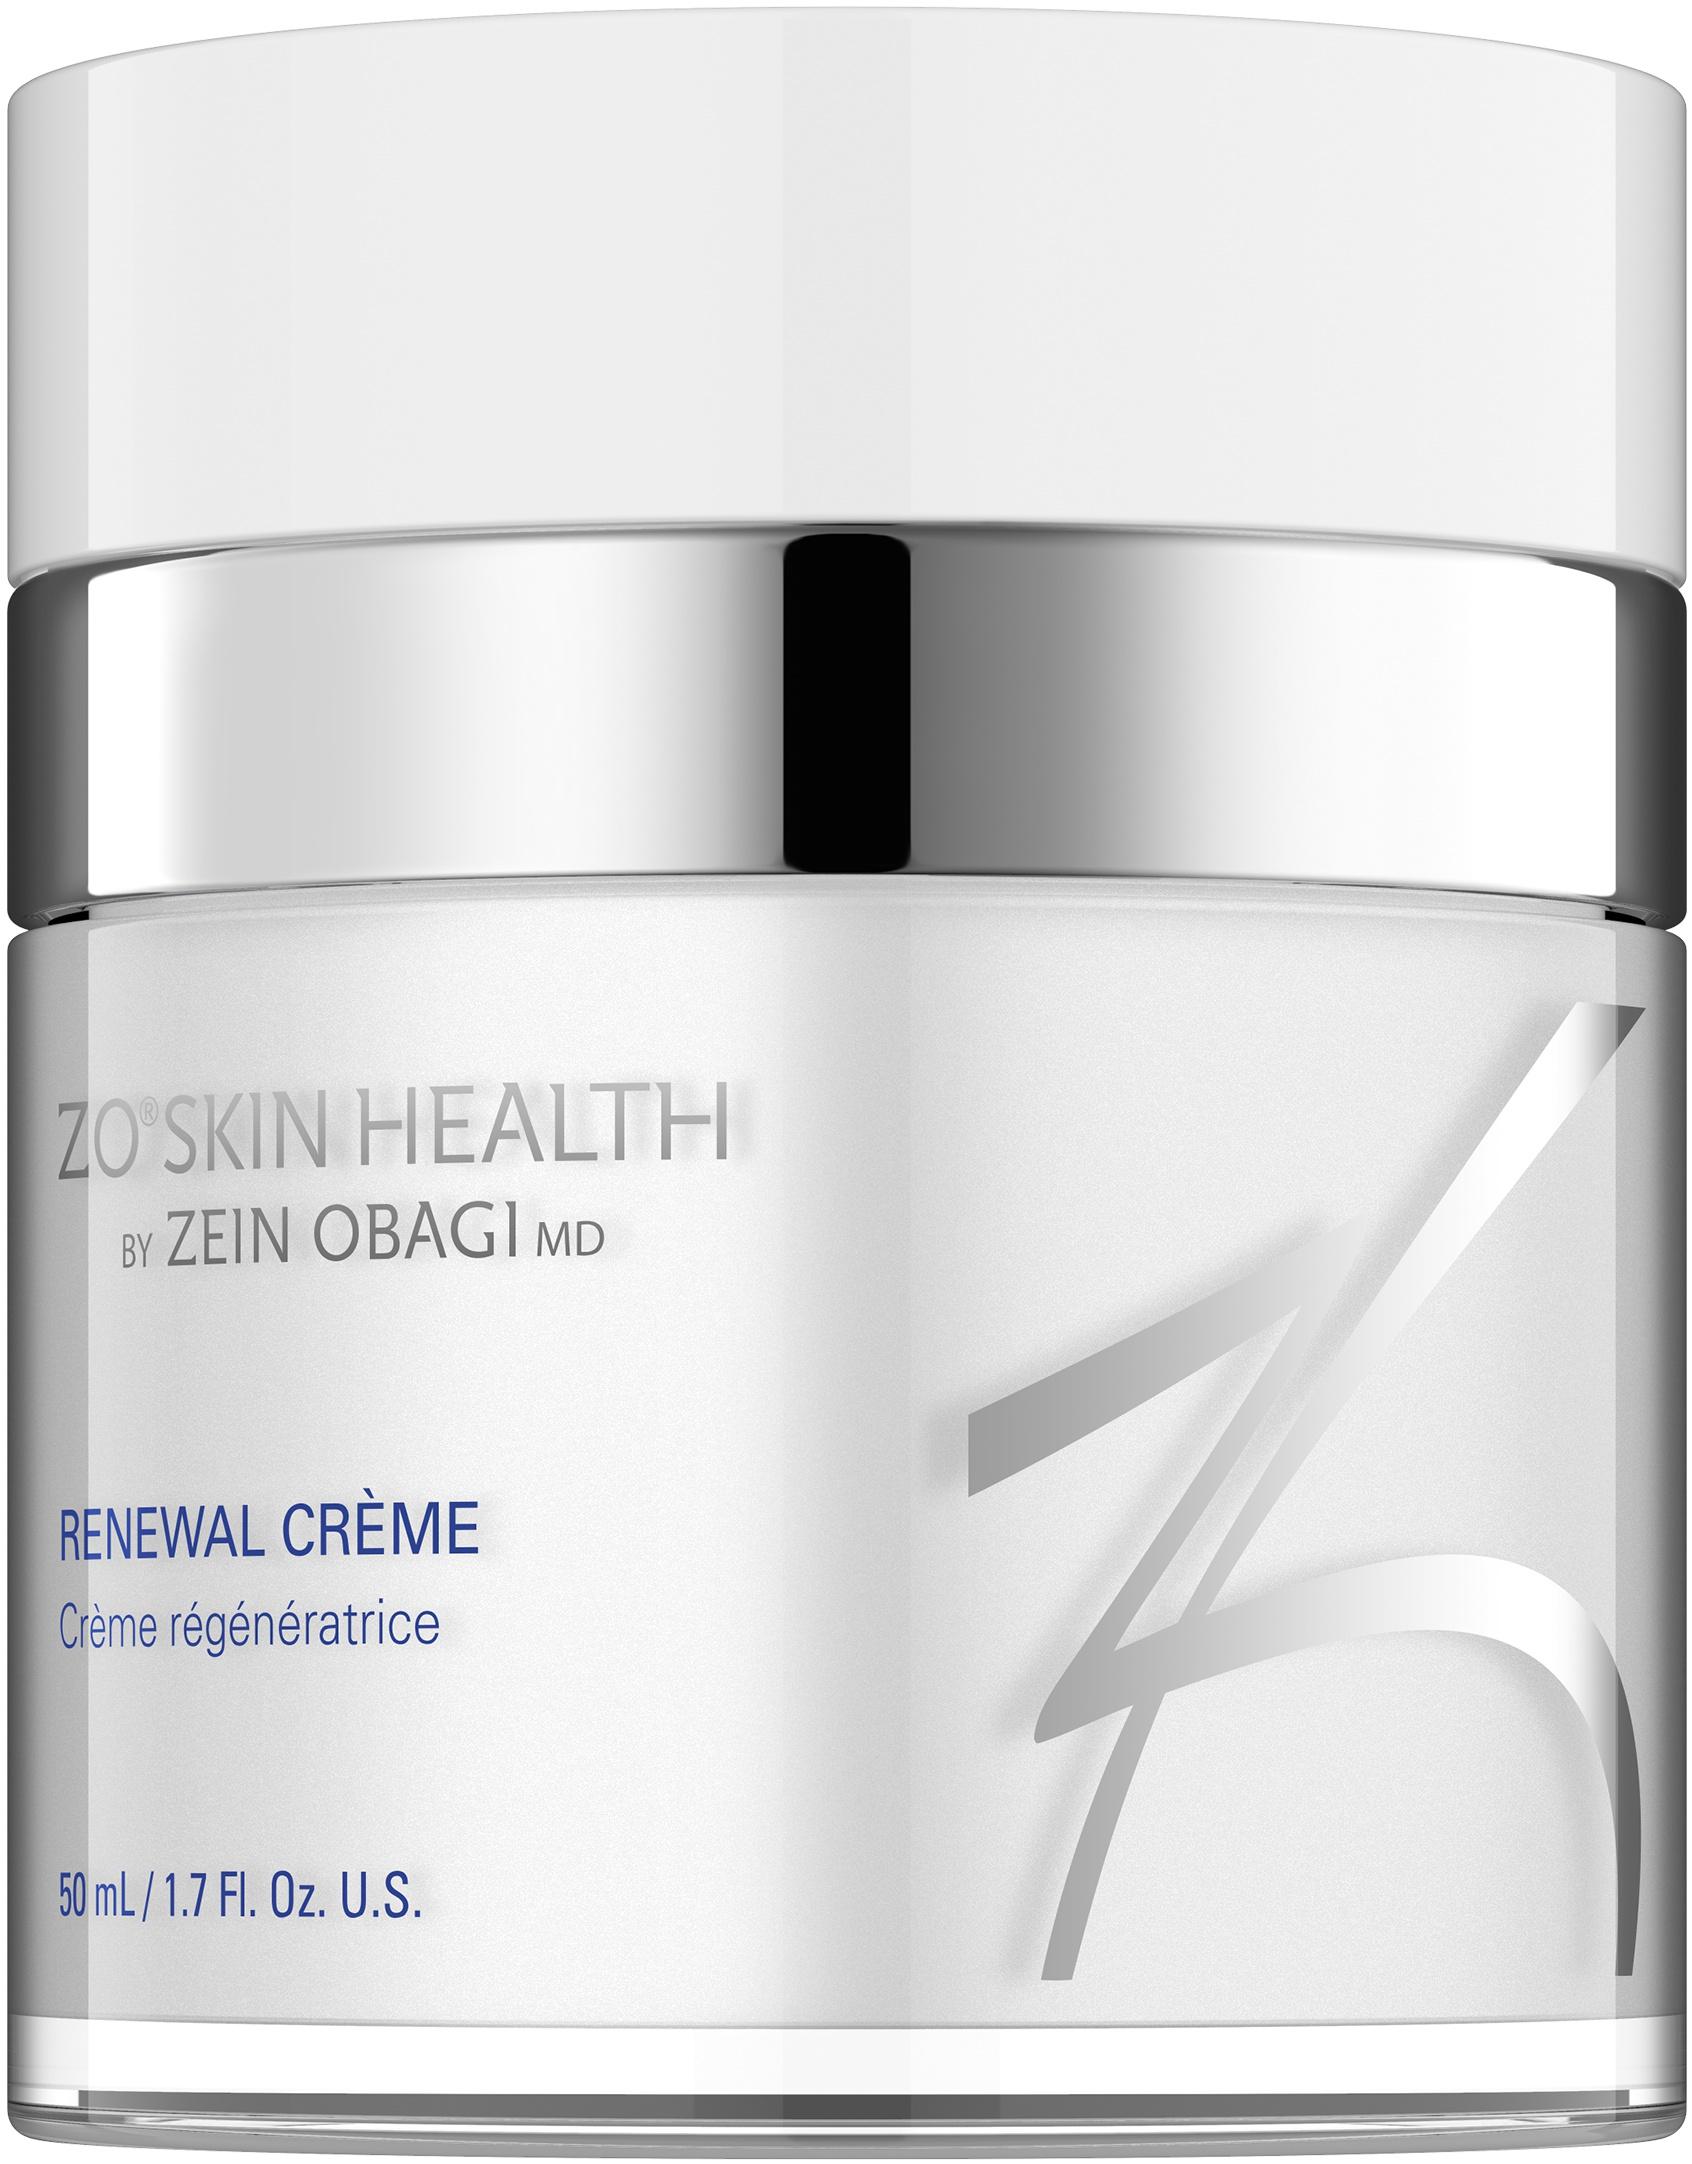 ZO® SKIN HEALTH Renewal Crème